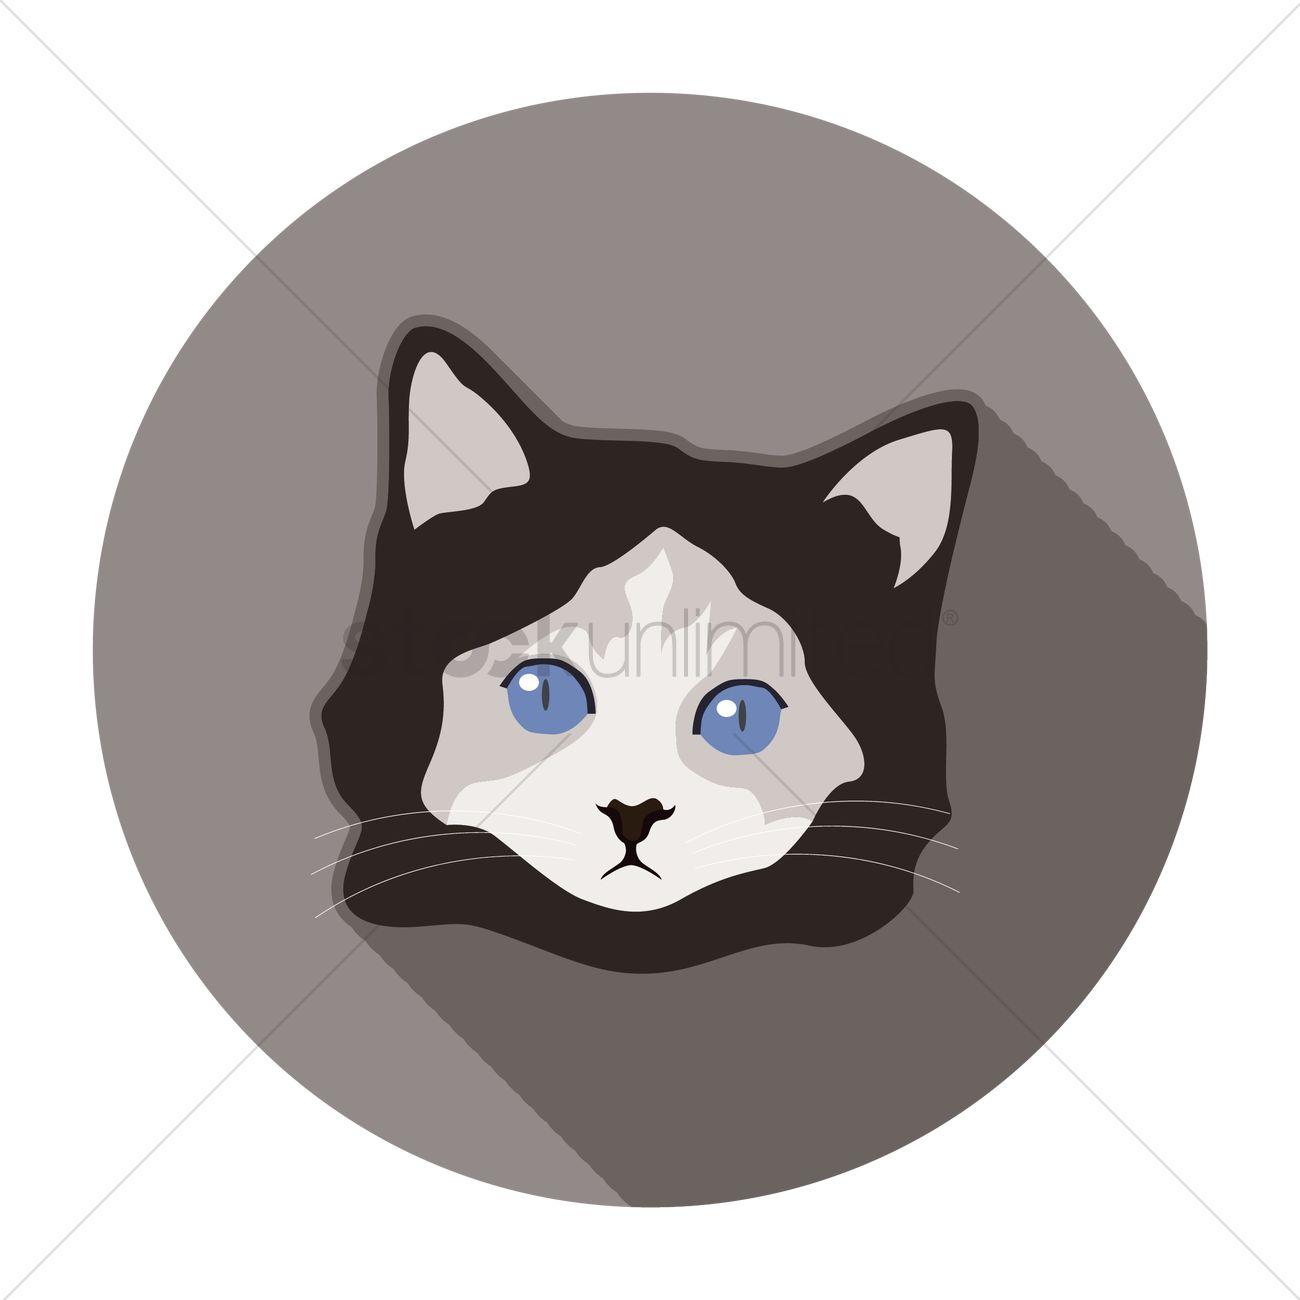 d00238c186c2 Cat face Vector Image - 1362443